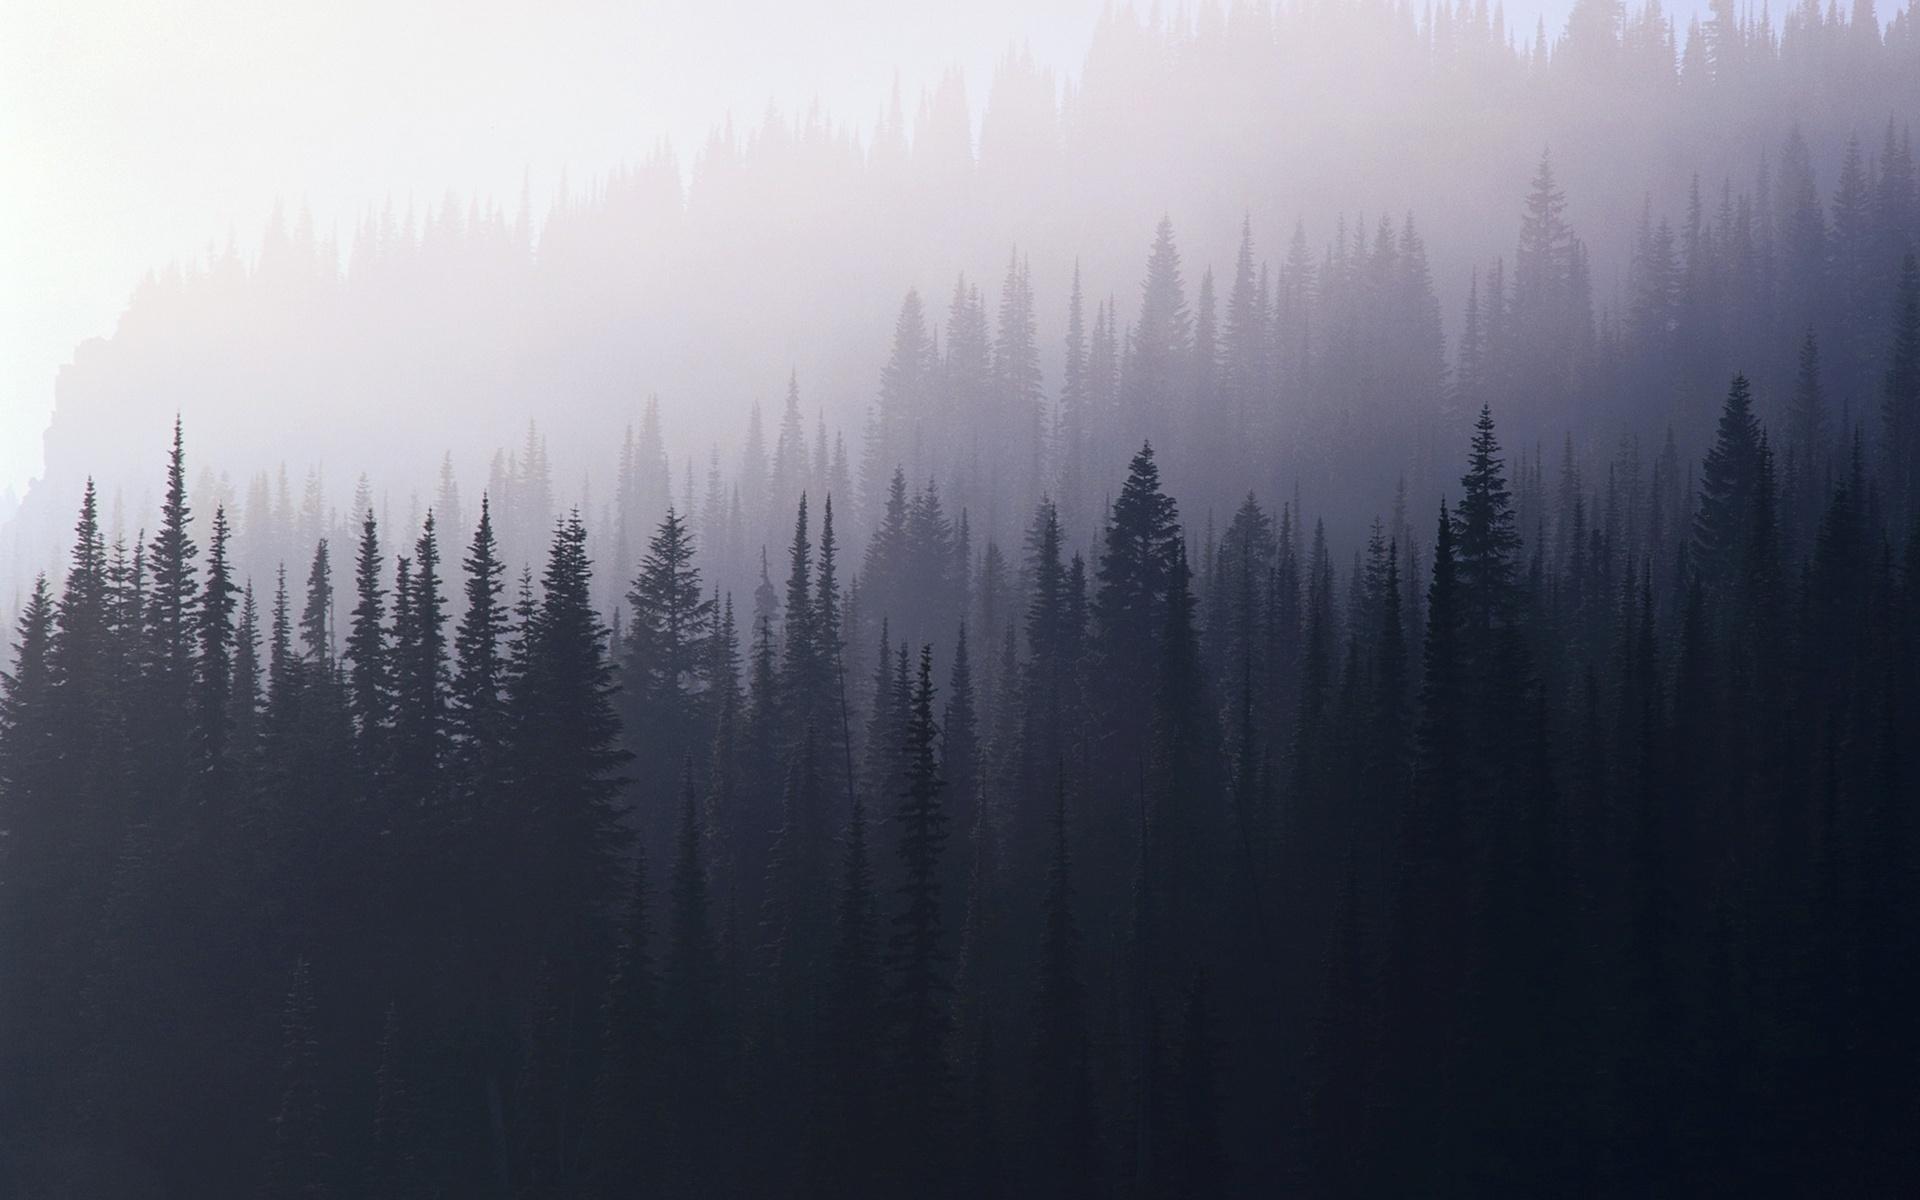 Foggy forest Wallpaper 24489 1920x1200